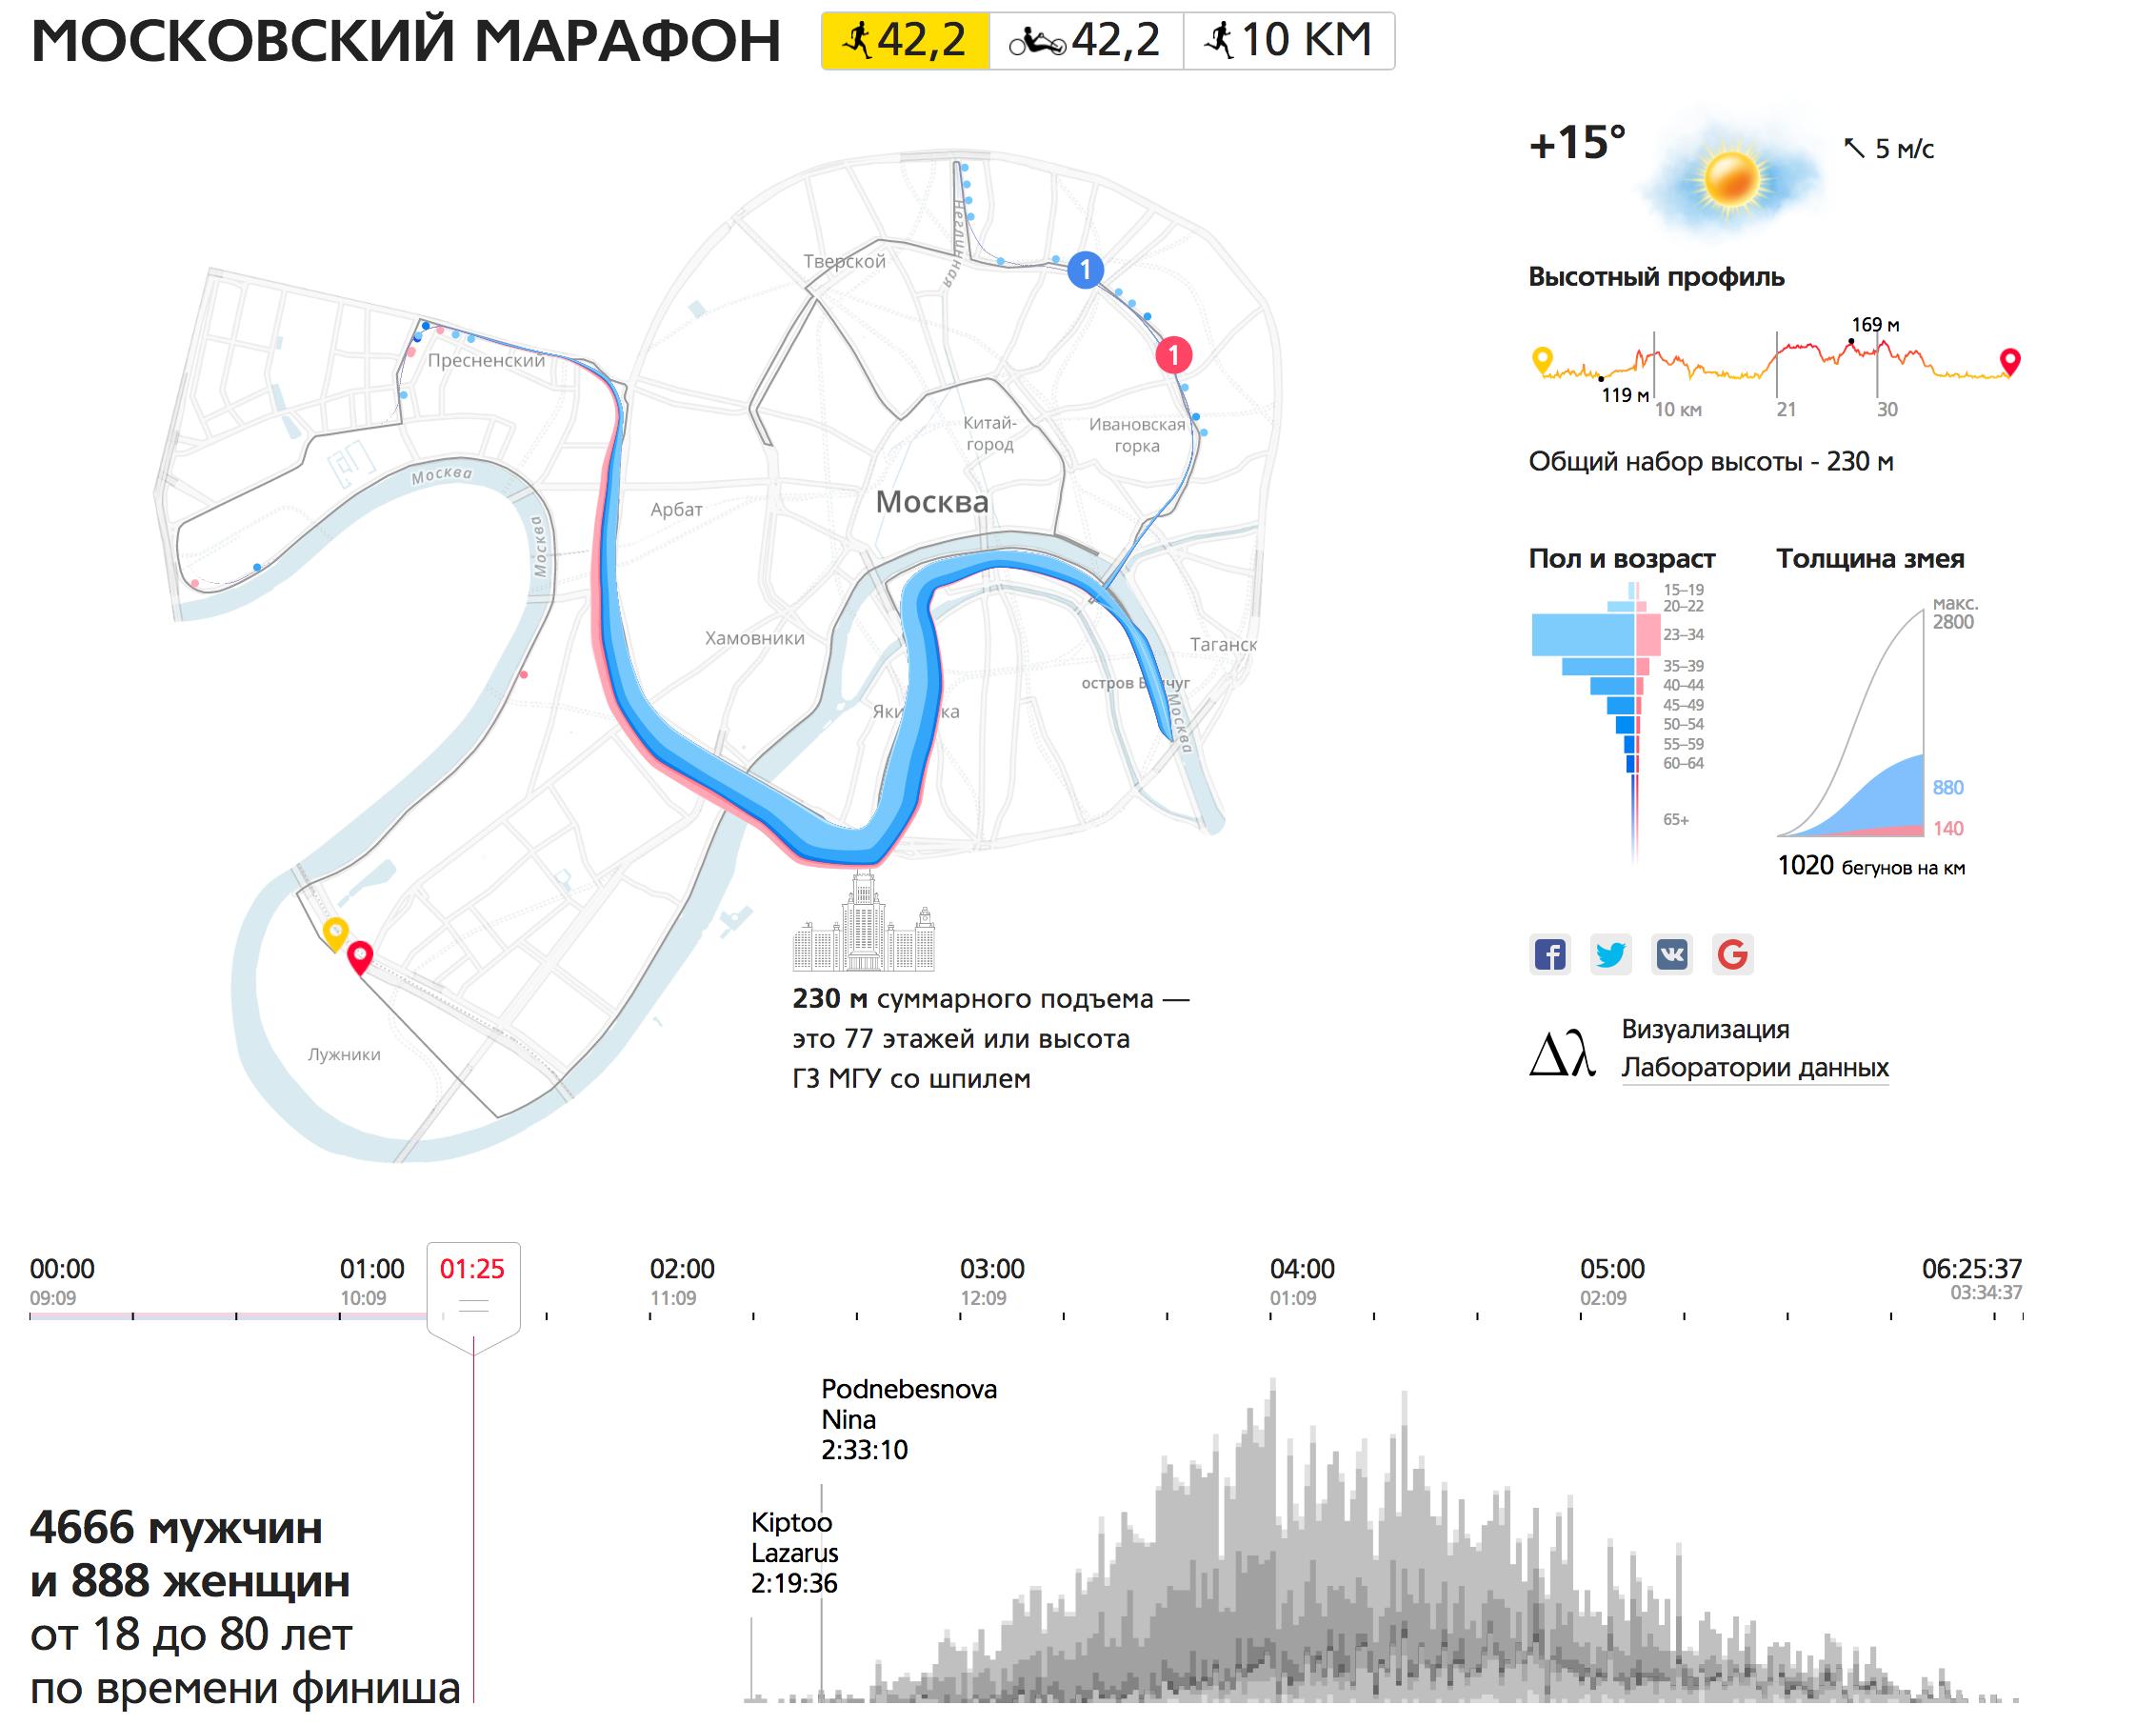 БДСЛ-2017: Таня Бибикова о визуализации данных - 3